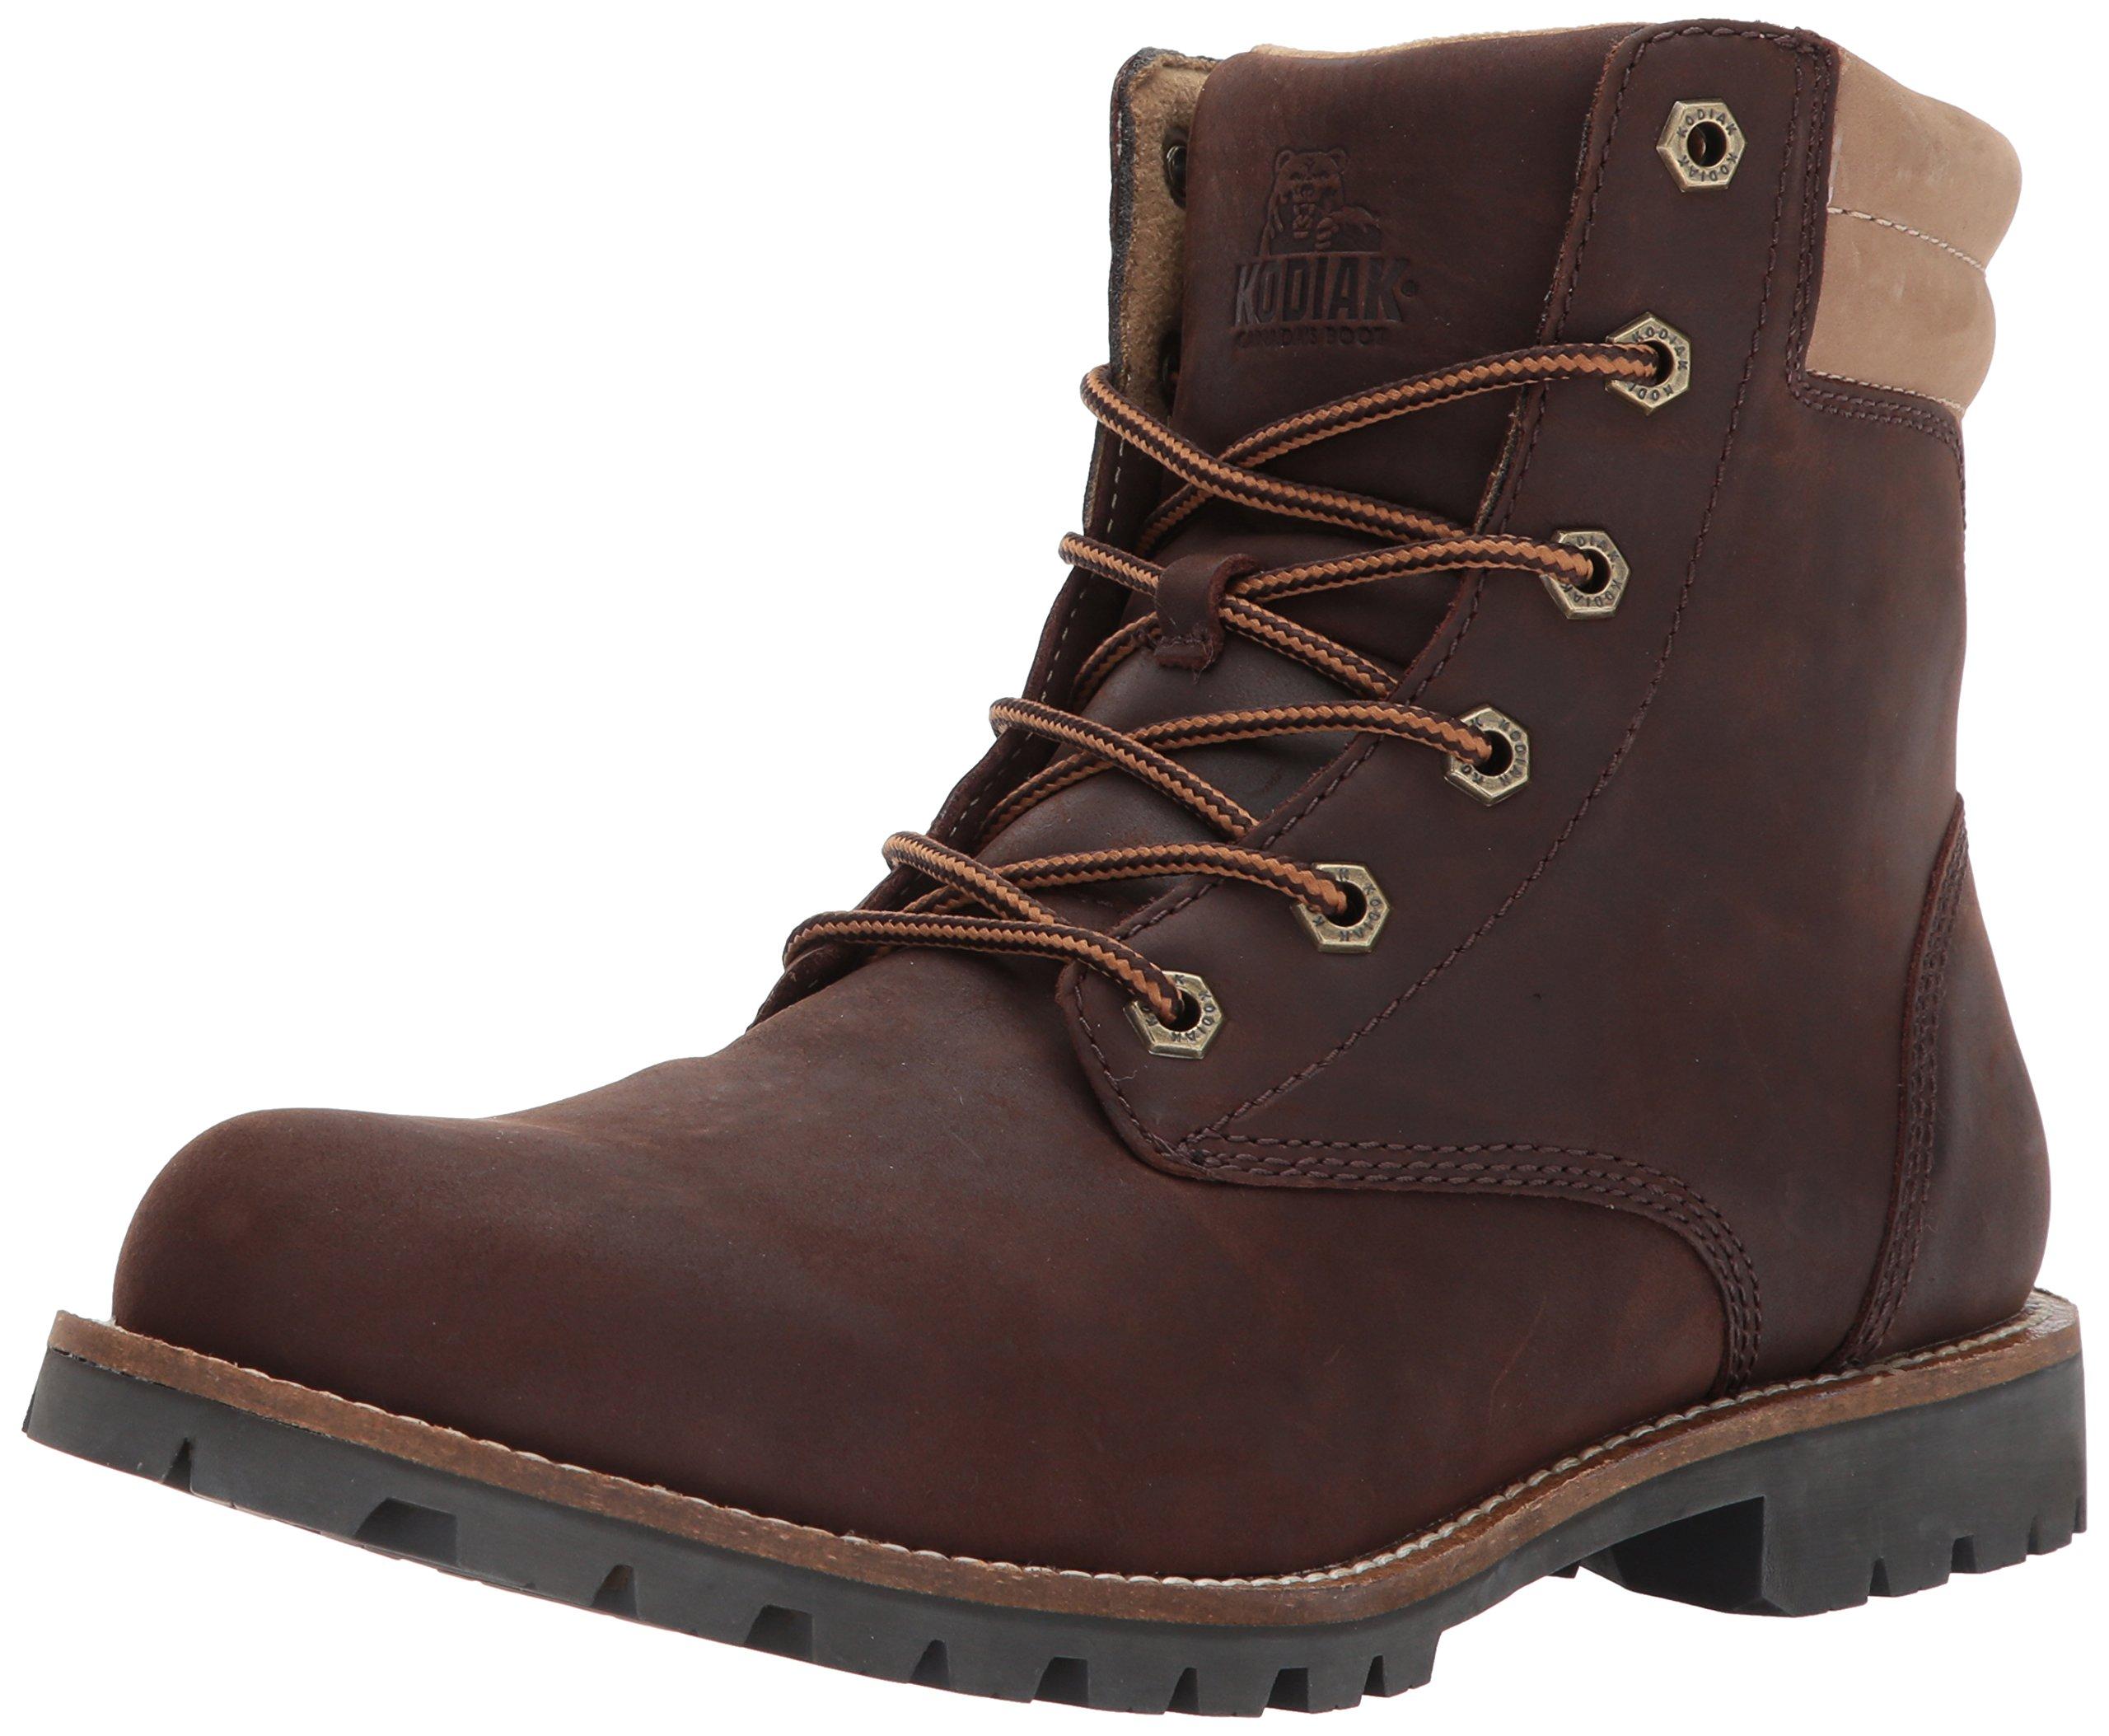 Kodiak Men's Magog Hiking Boot, Brown, 9.5 M US